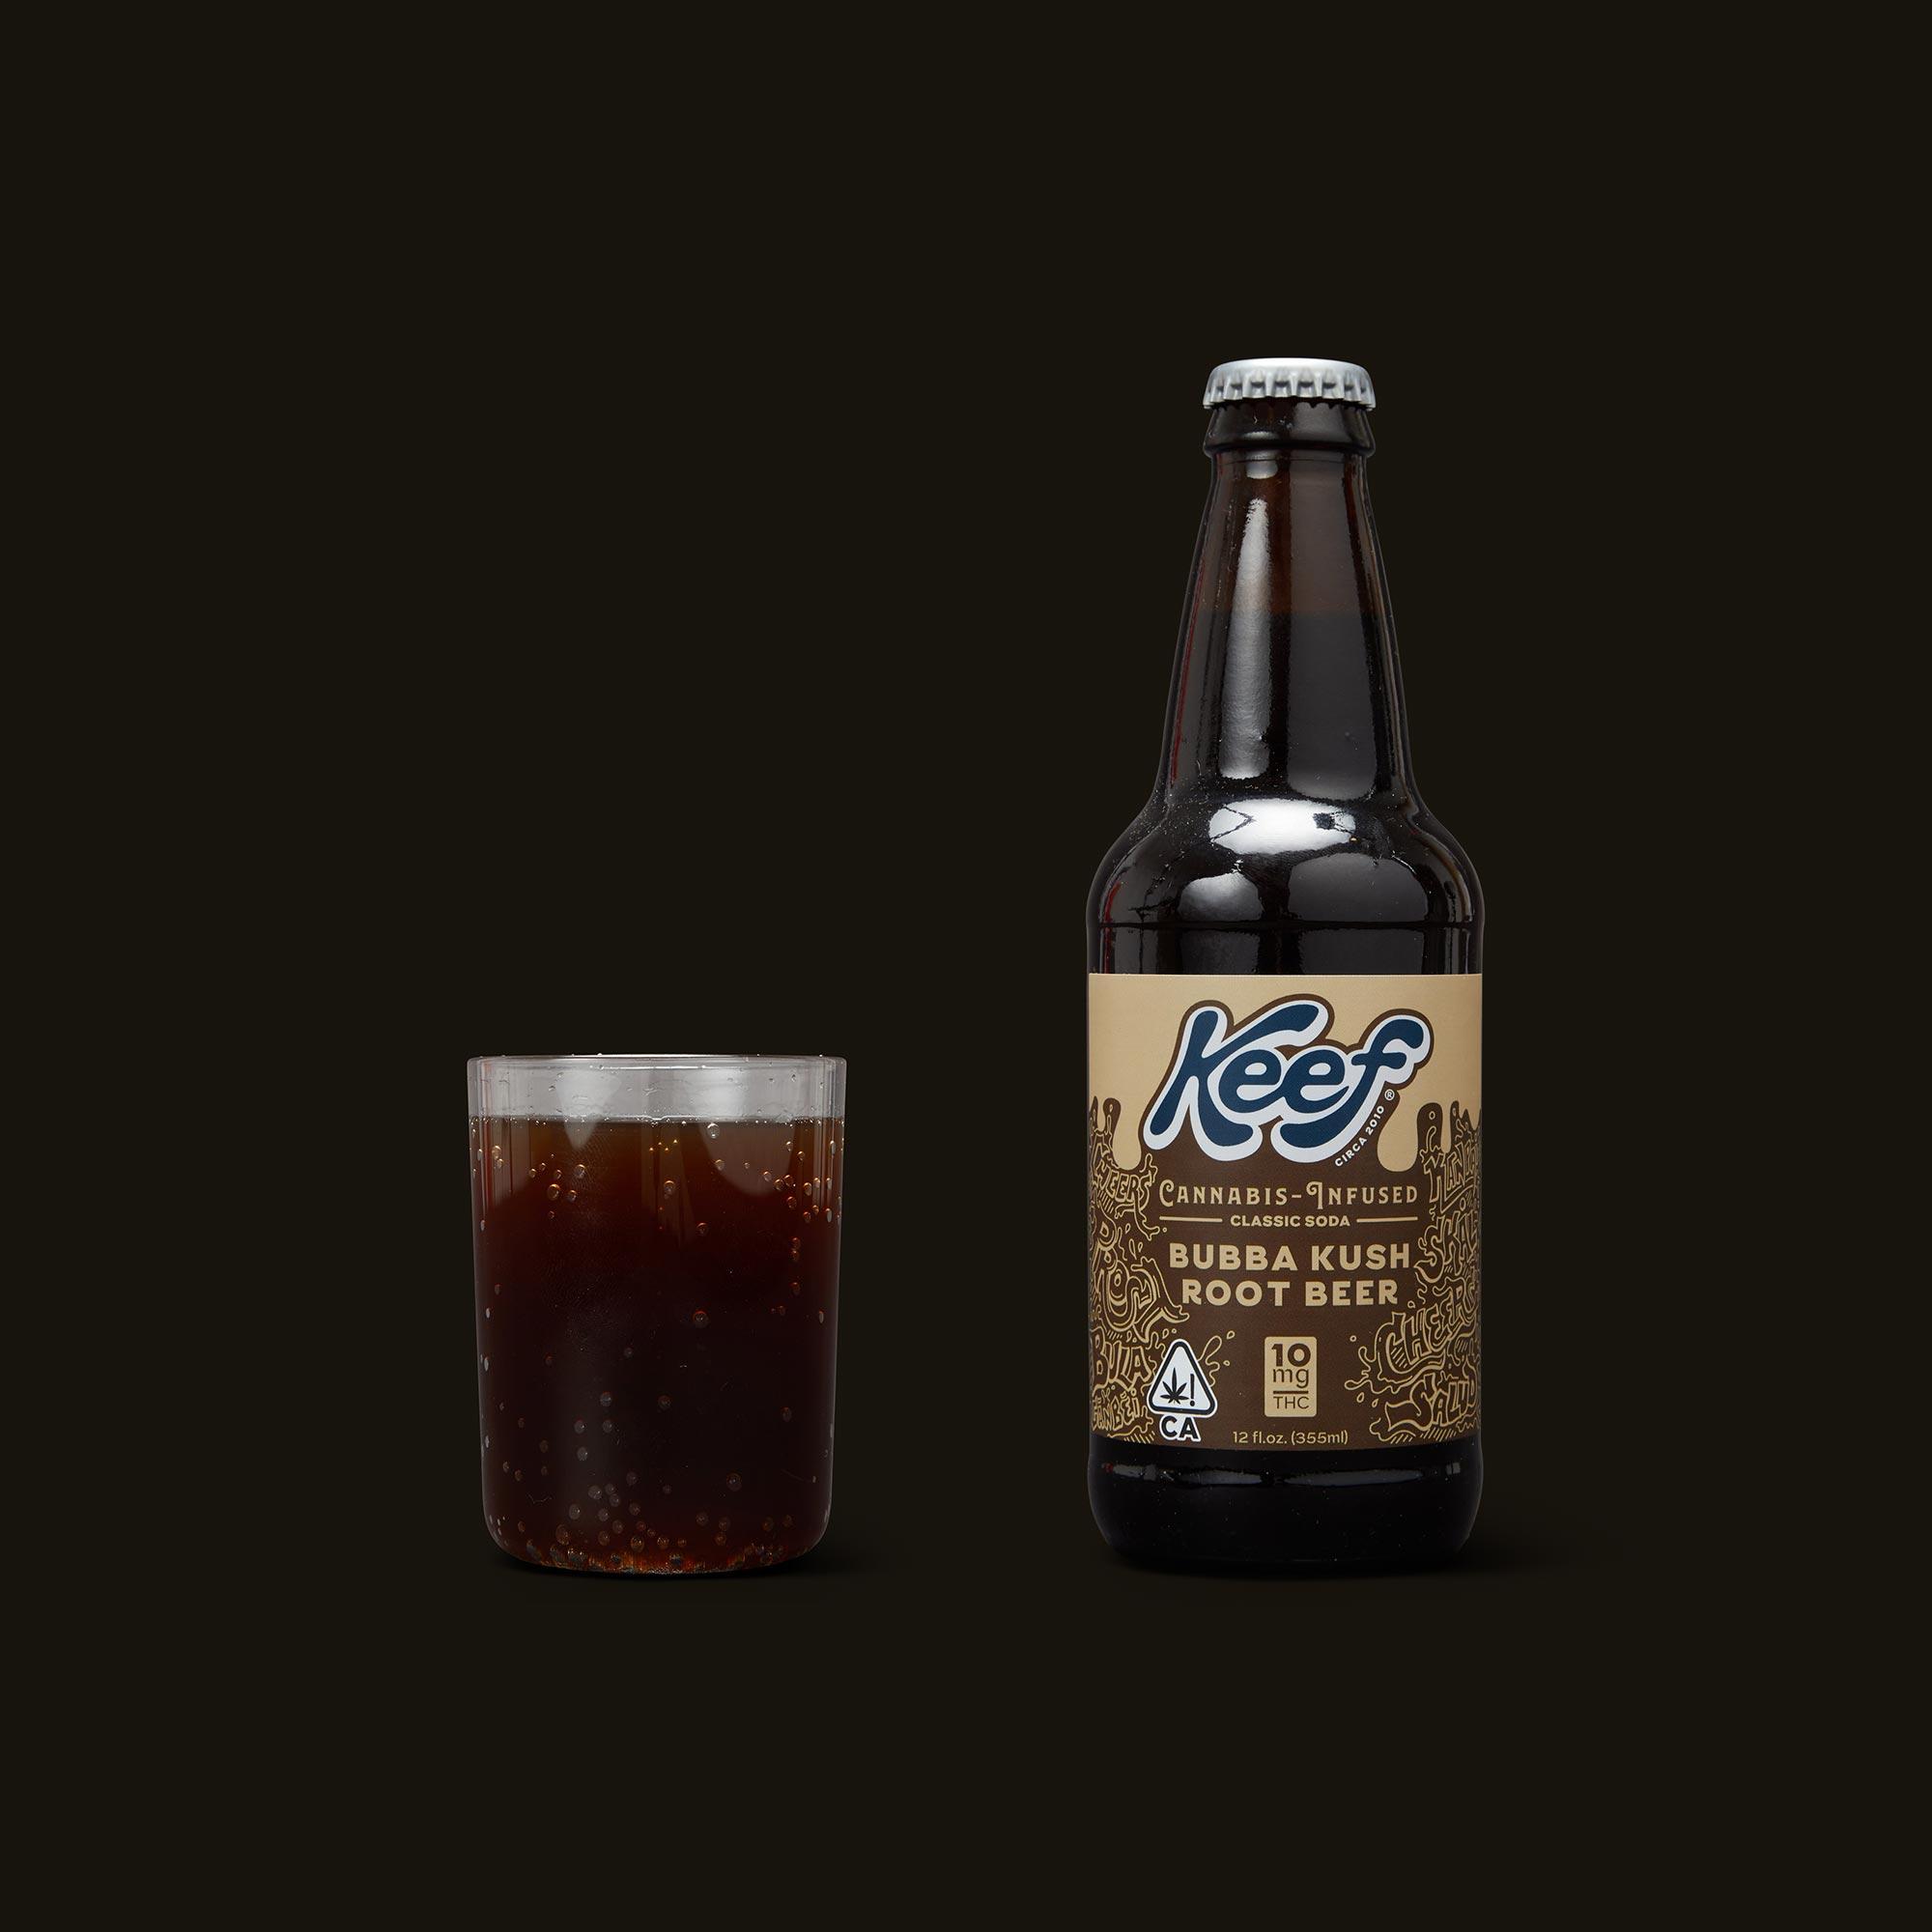 Keef Cola Bubba Kush Root Beer